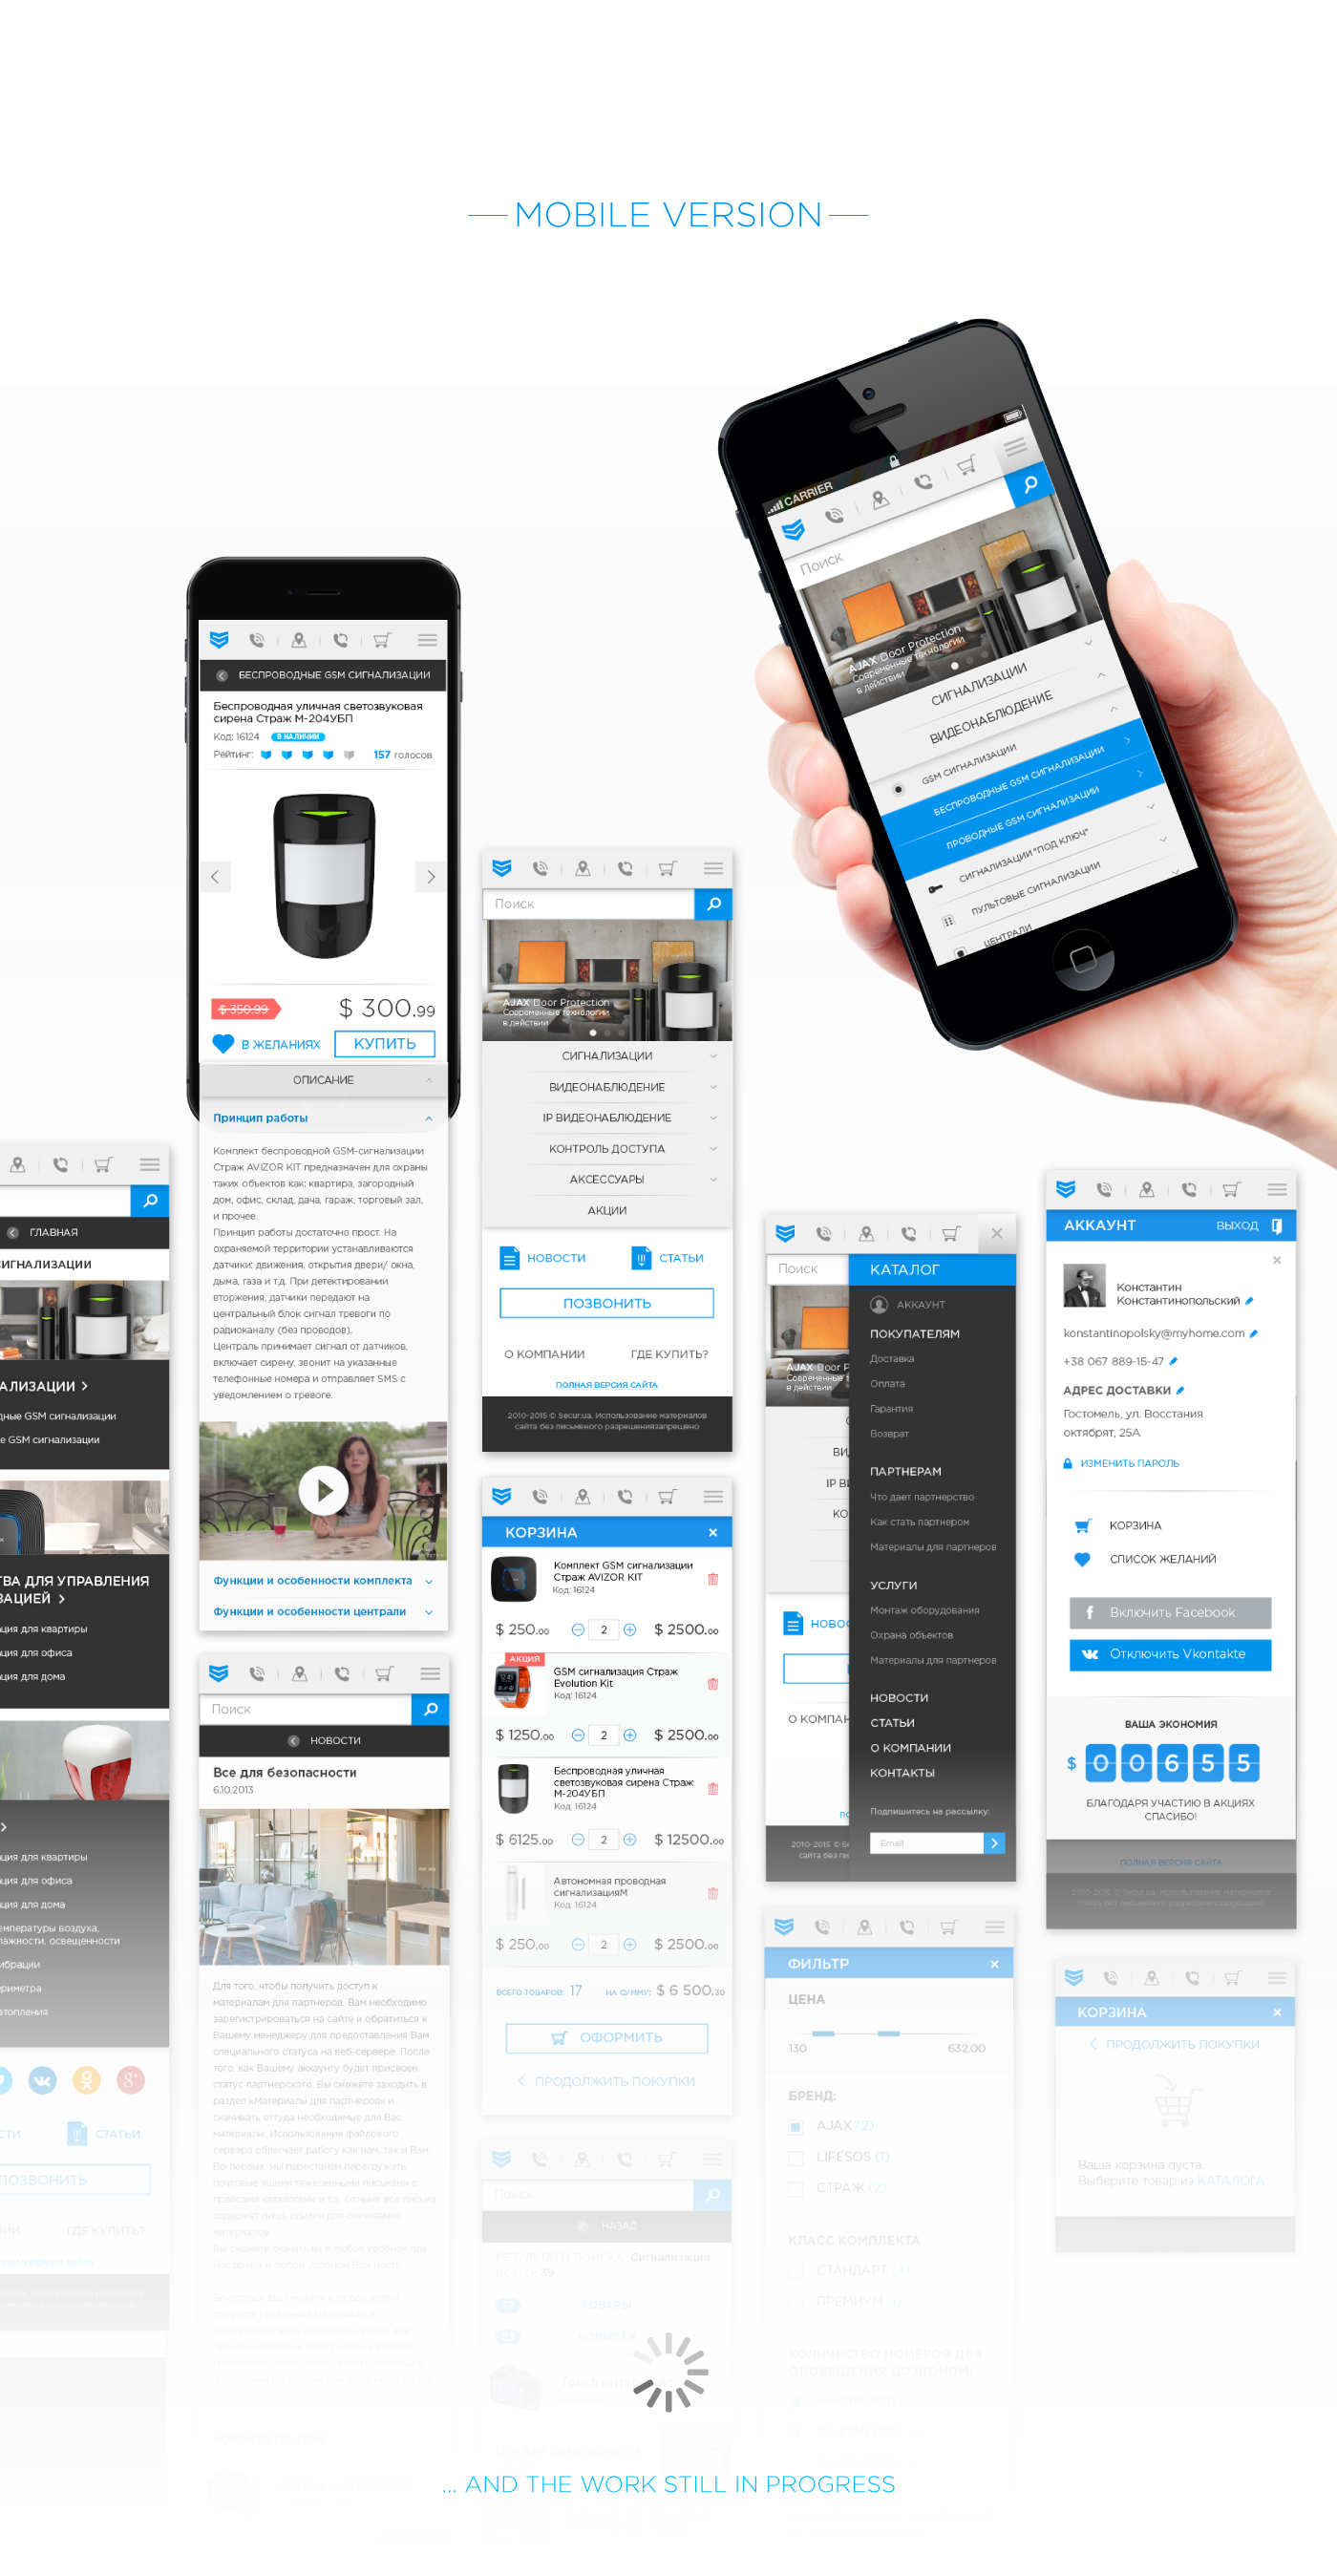 secur re-design iondigital mobile identity logo redesign security